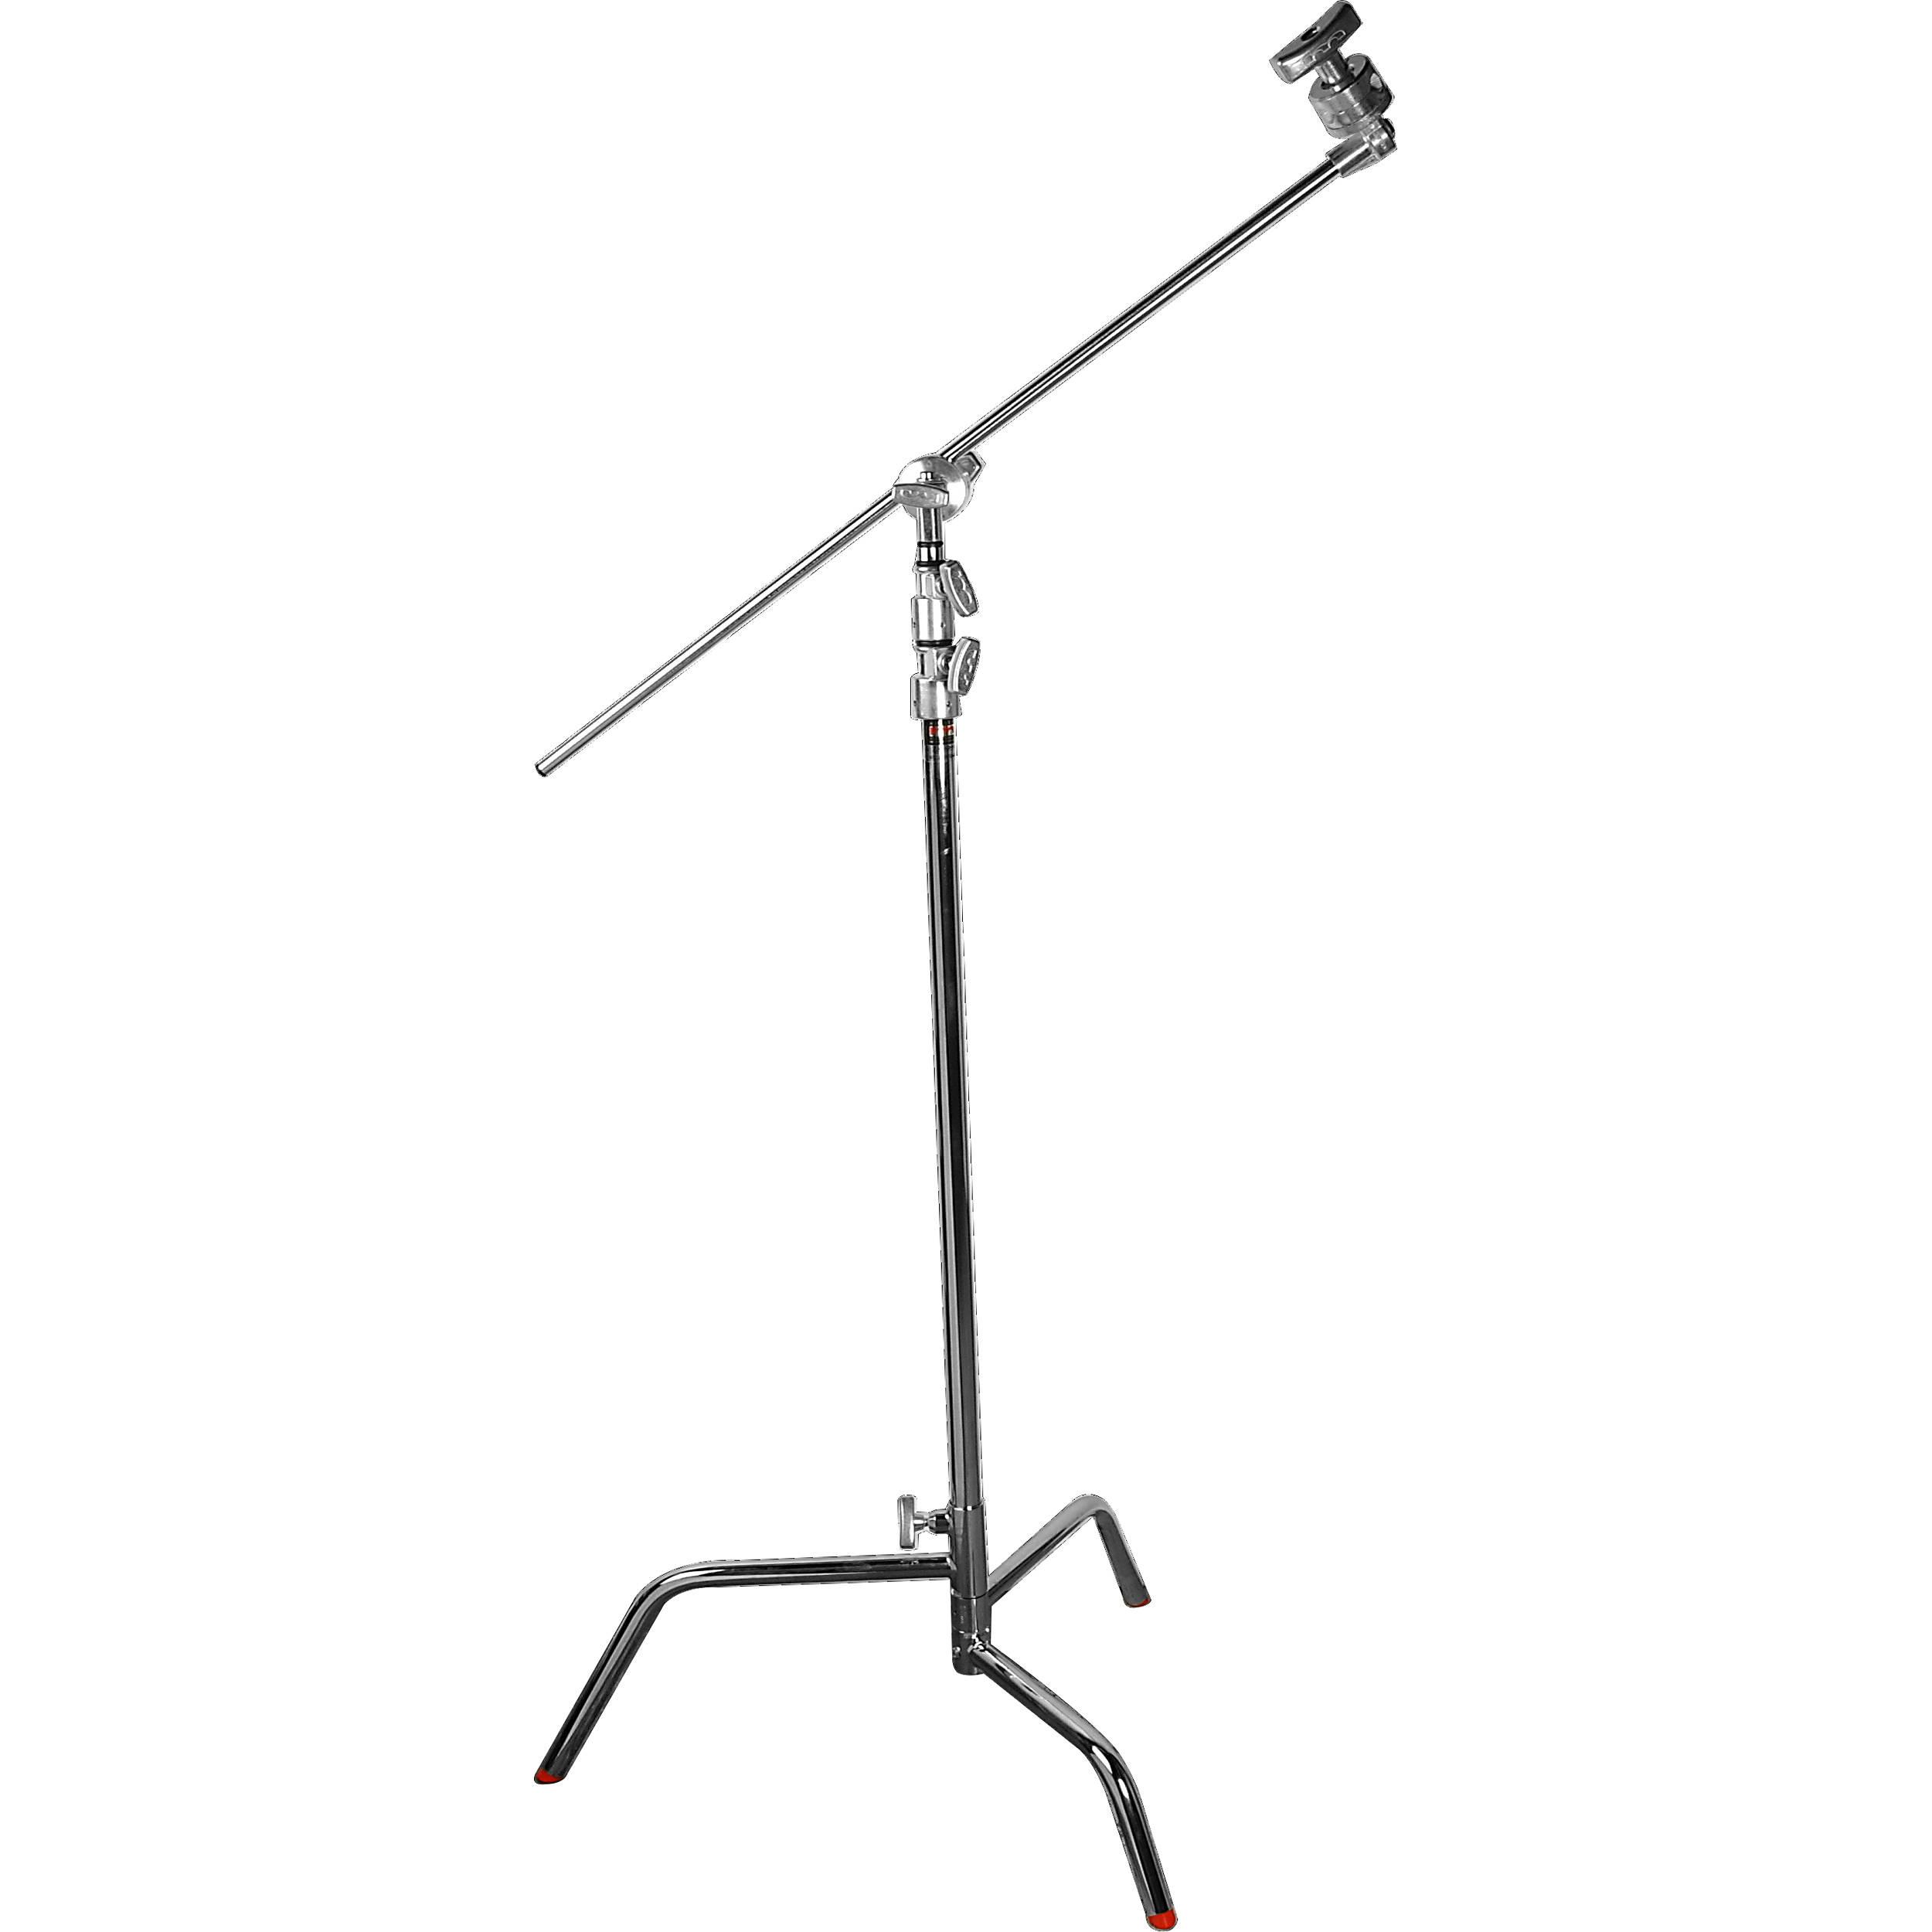 Heavy Duty C-Stand Century Stand Gobo Arm Grip Head Studio Lighting Sandbag Kit